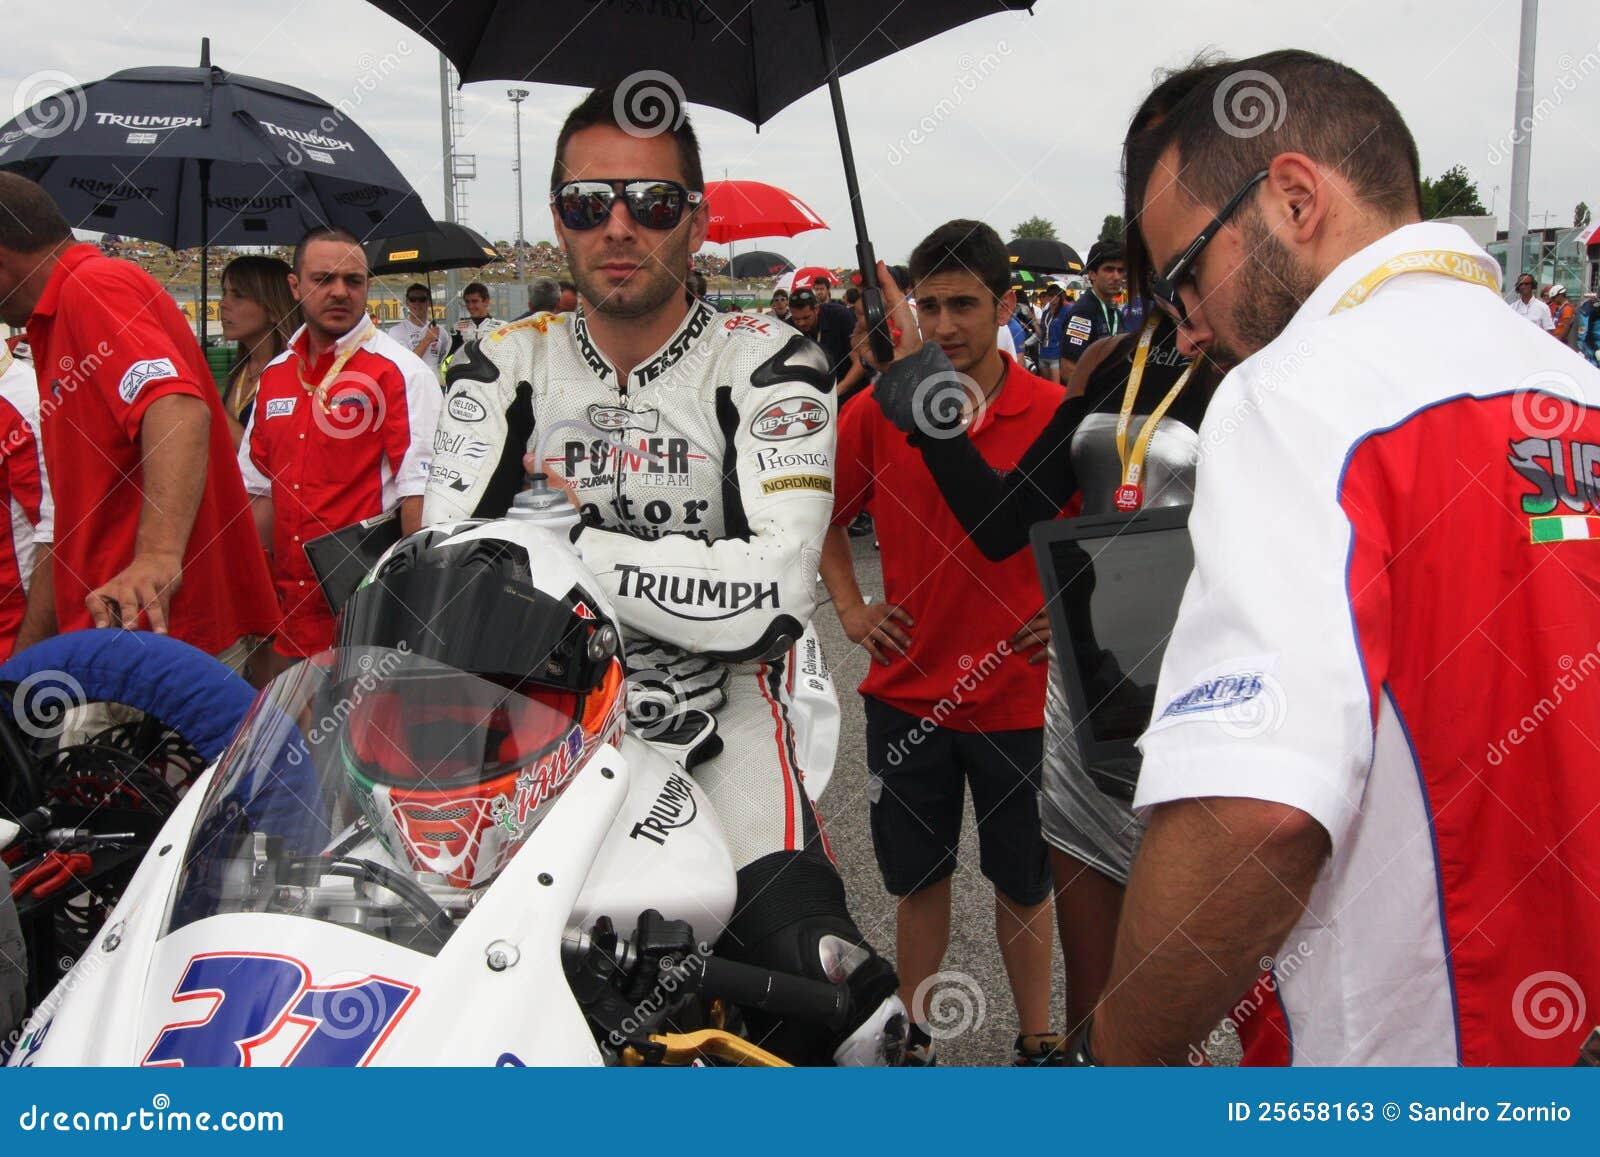 Vittorio Iannuzzo Triumph Daytona Suriano